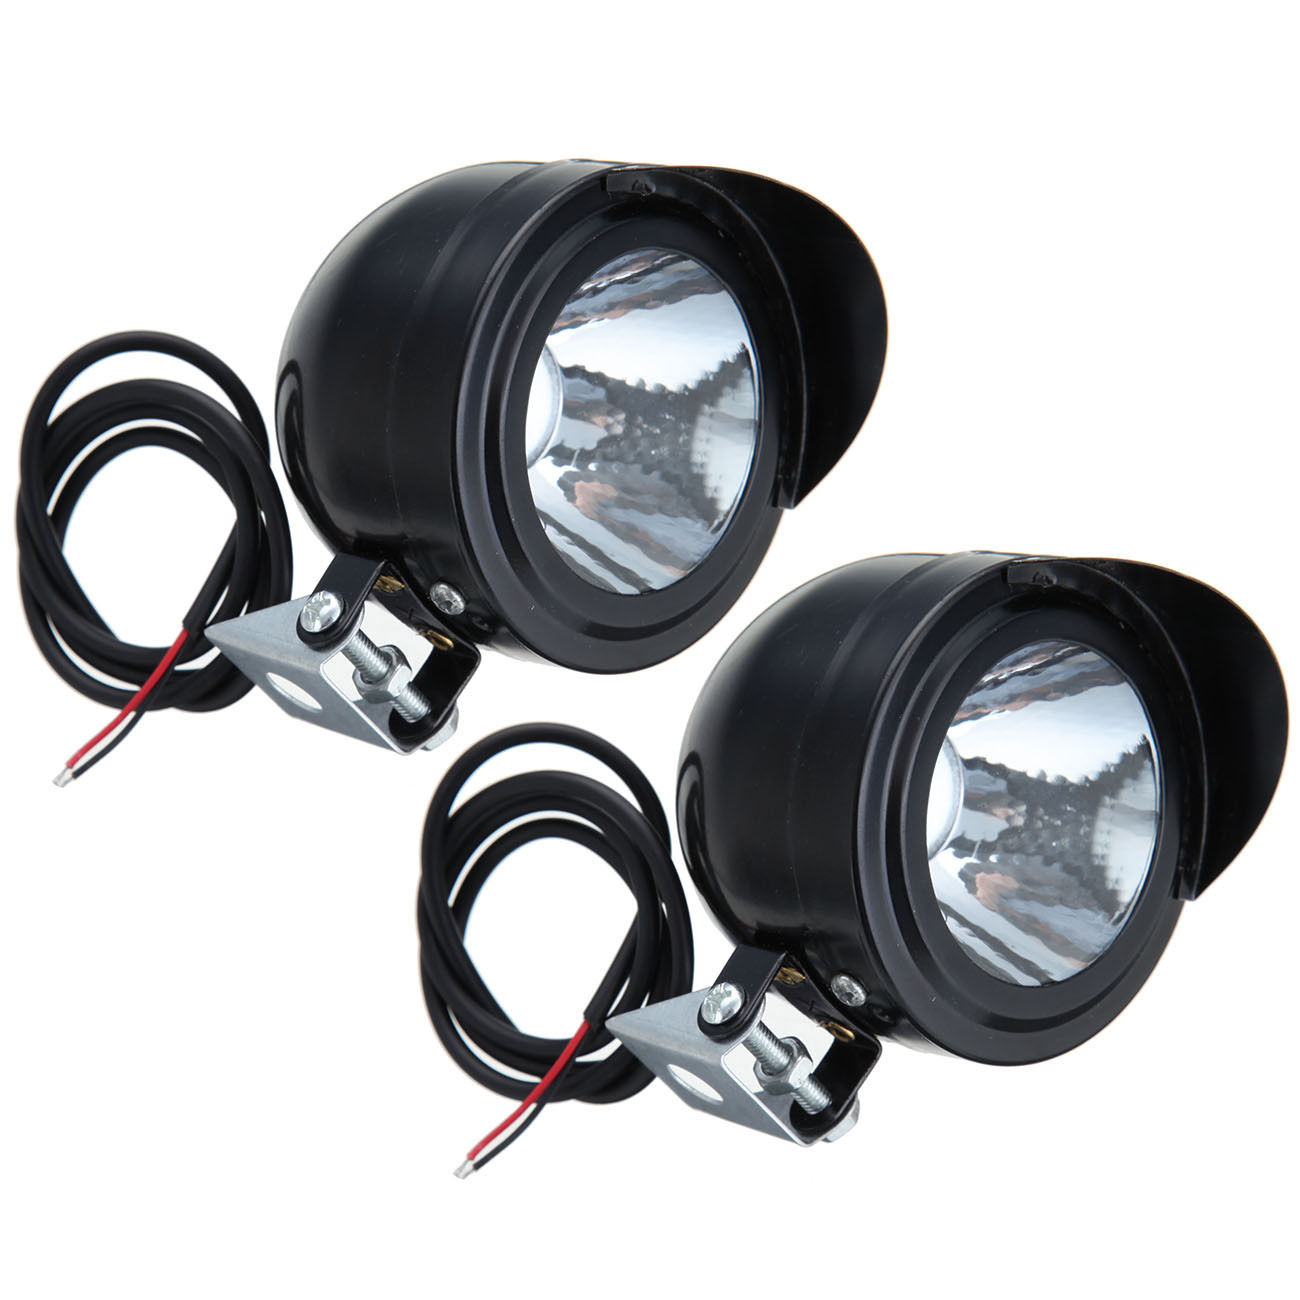 Aliexpress.com : Buy Motorcycle Motorbike Bike LED